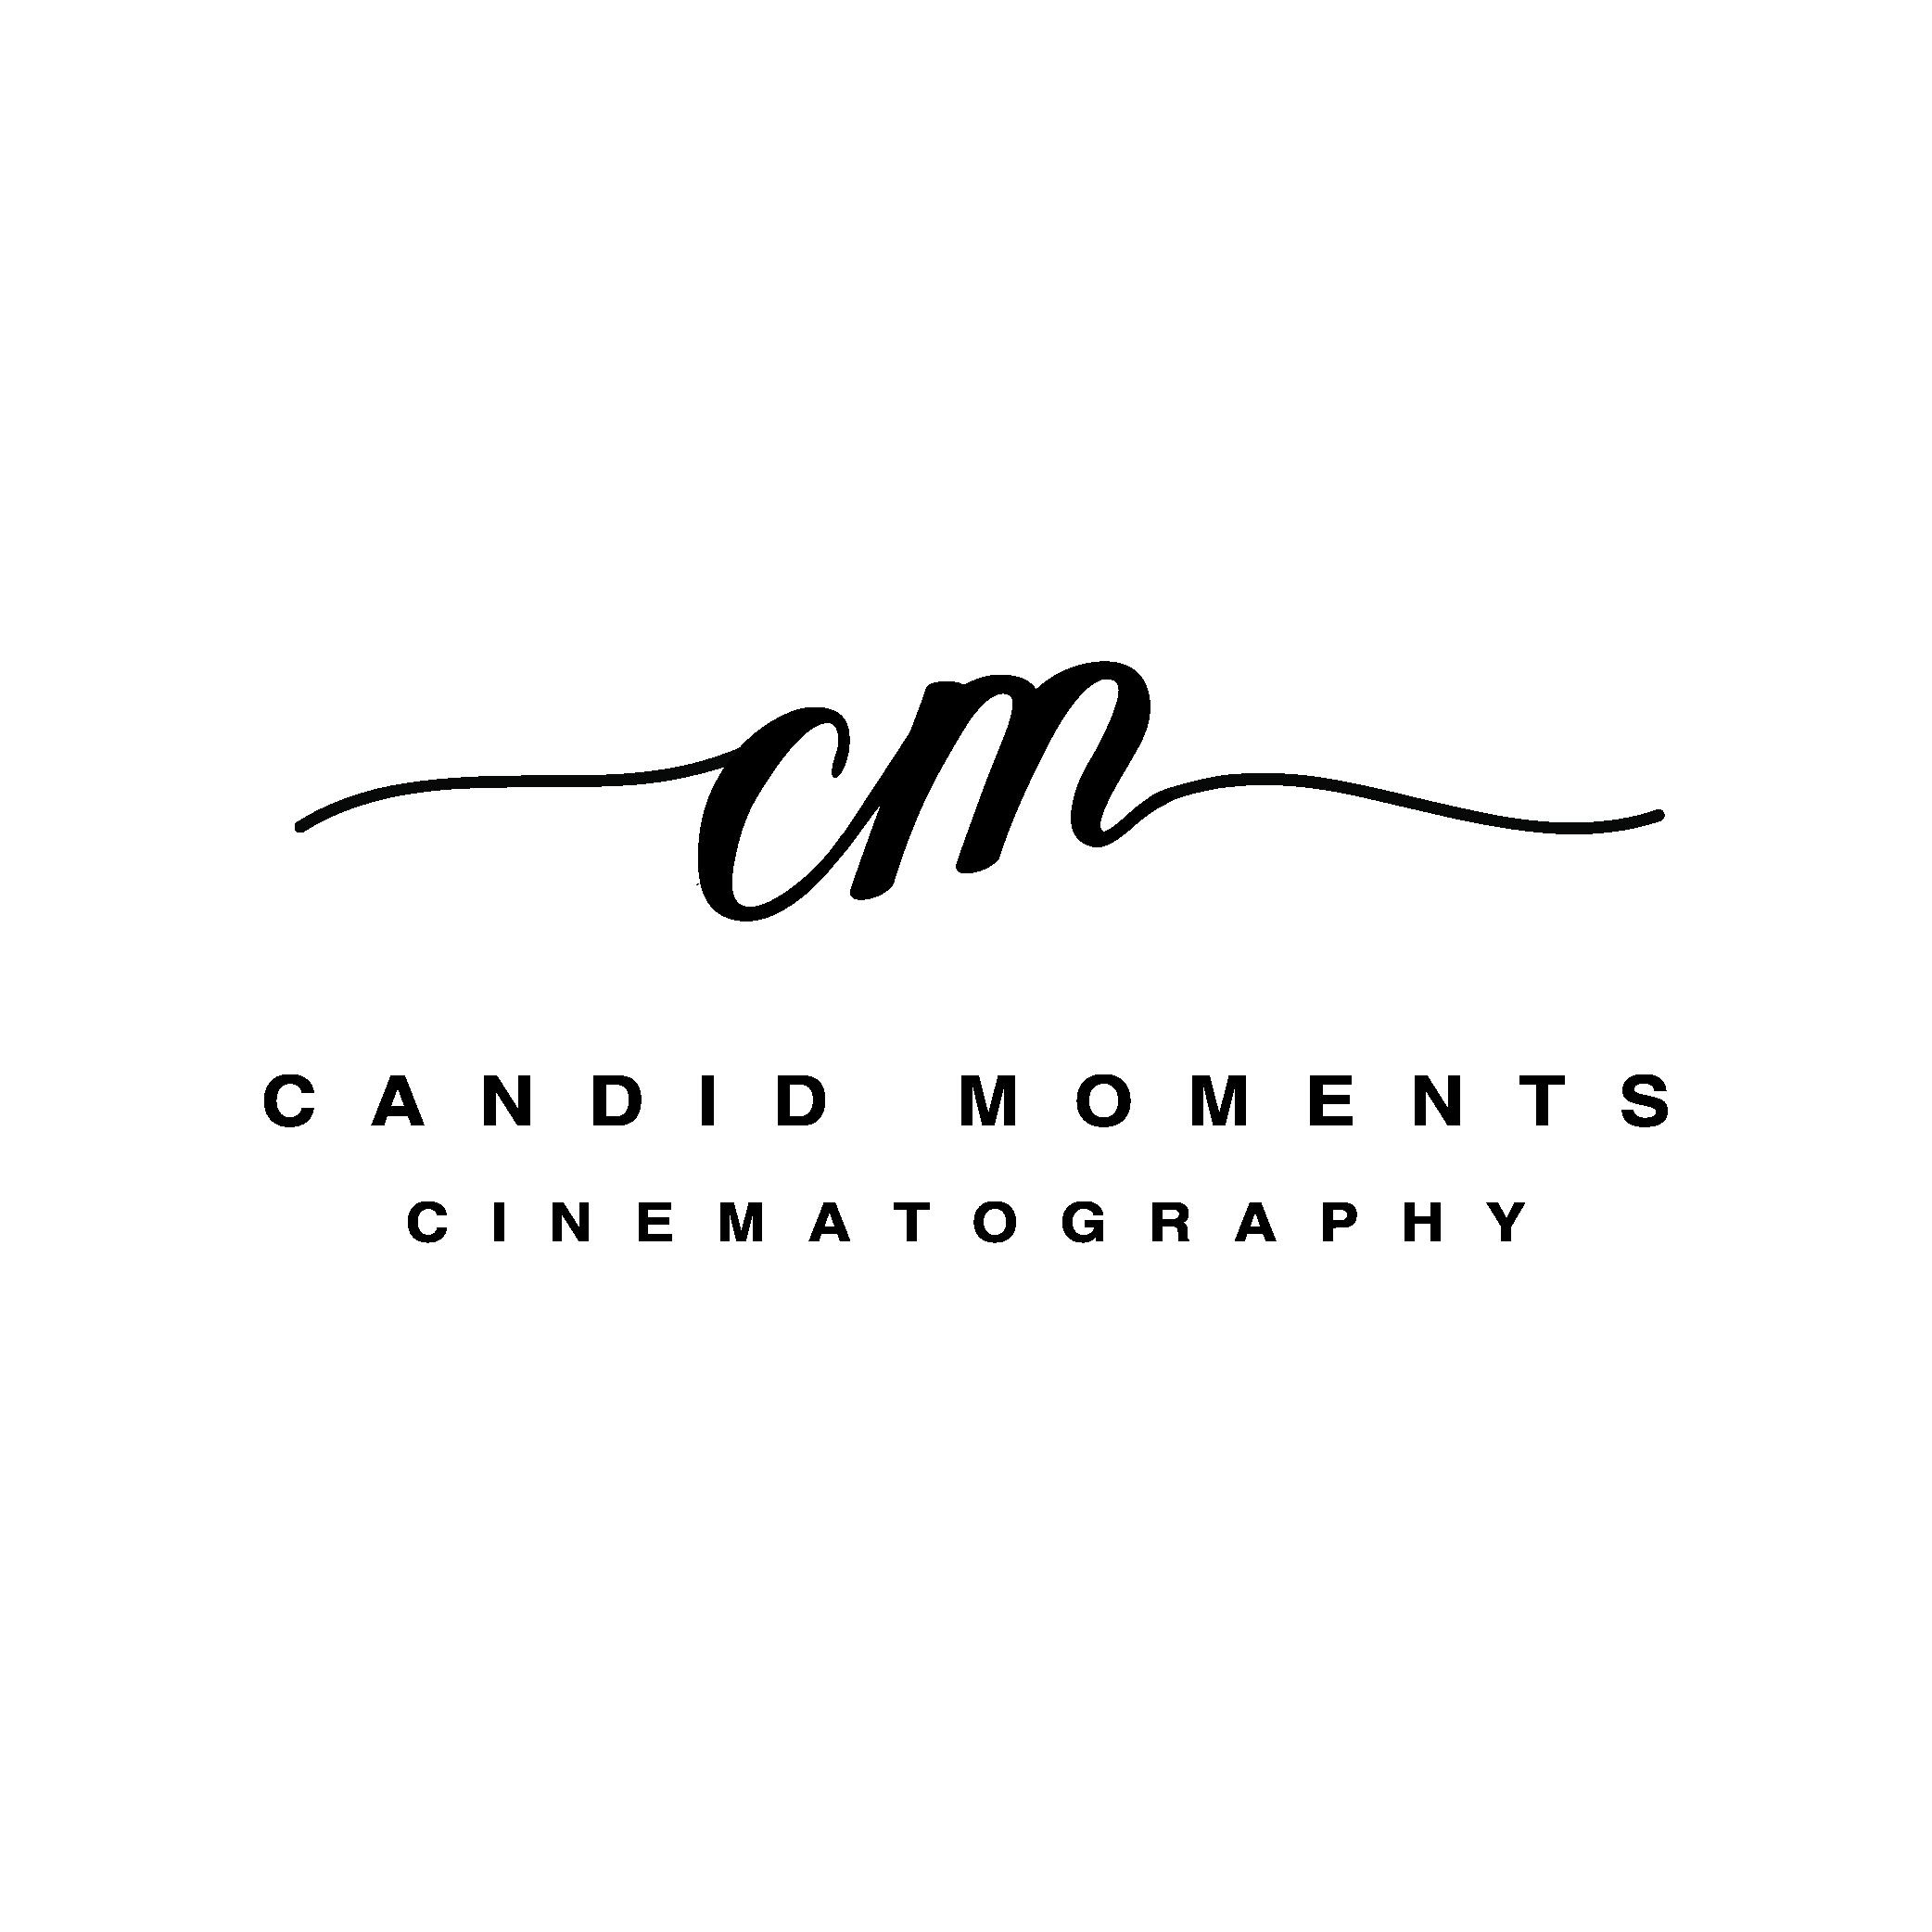 CandidMoments_logo_black trans-01.png